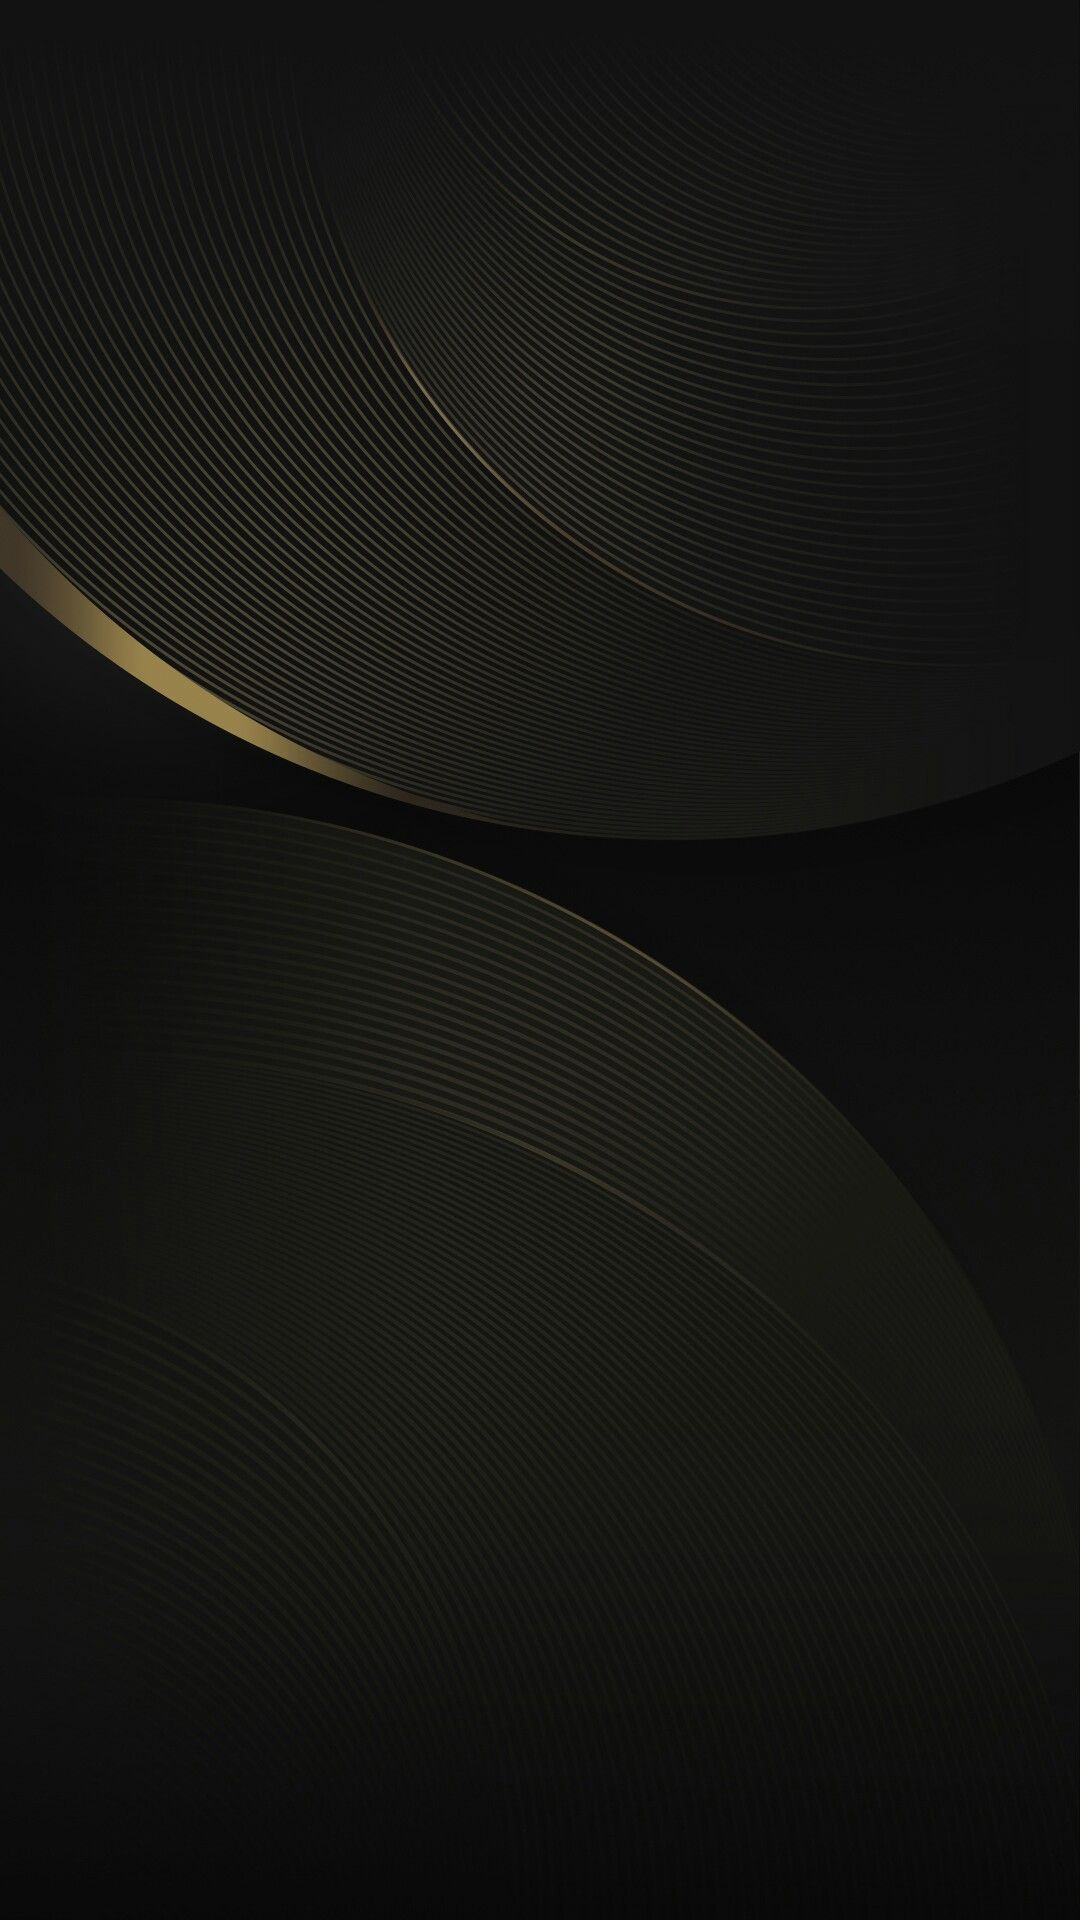 Pin by Iyan Sofyan on Material °Minimal °Pattern